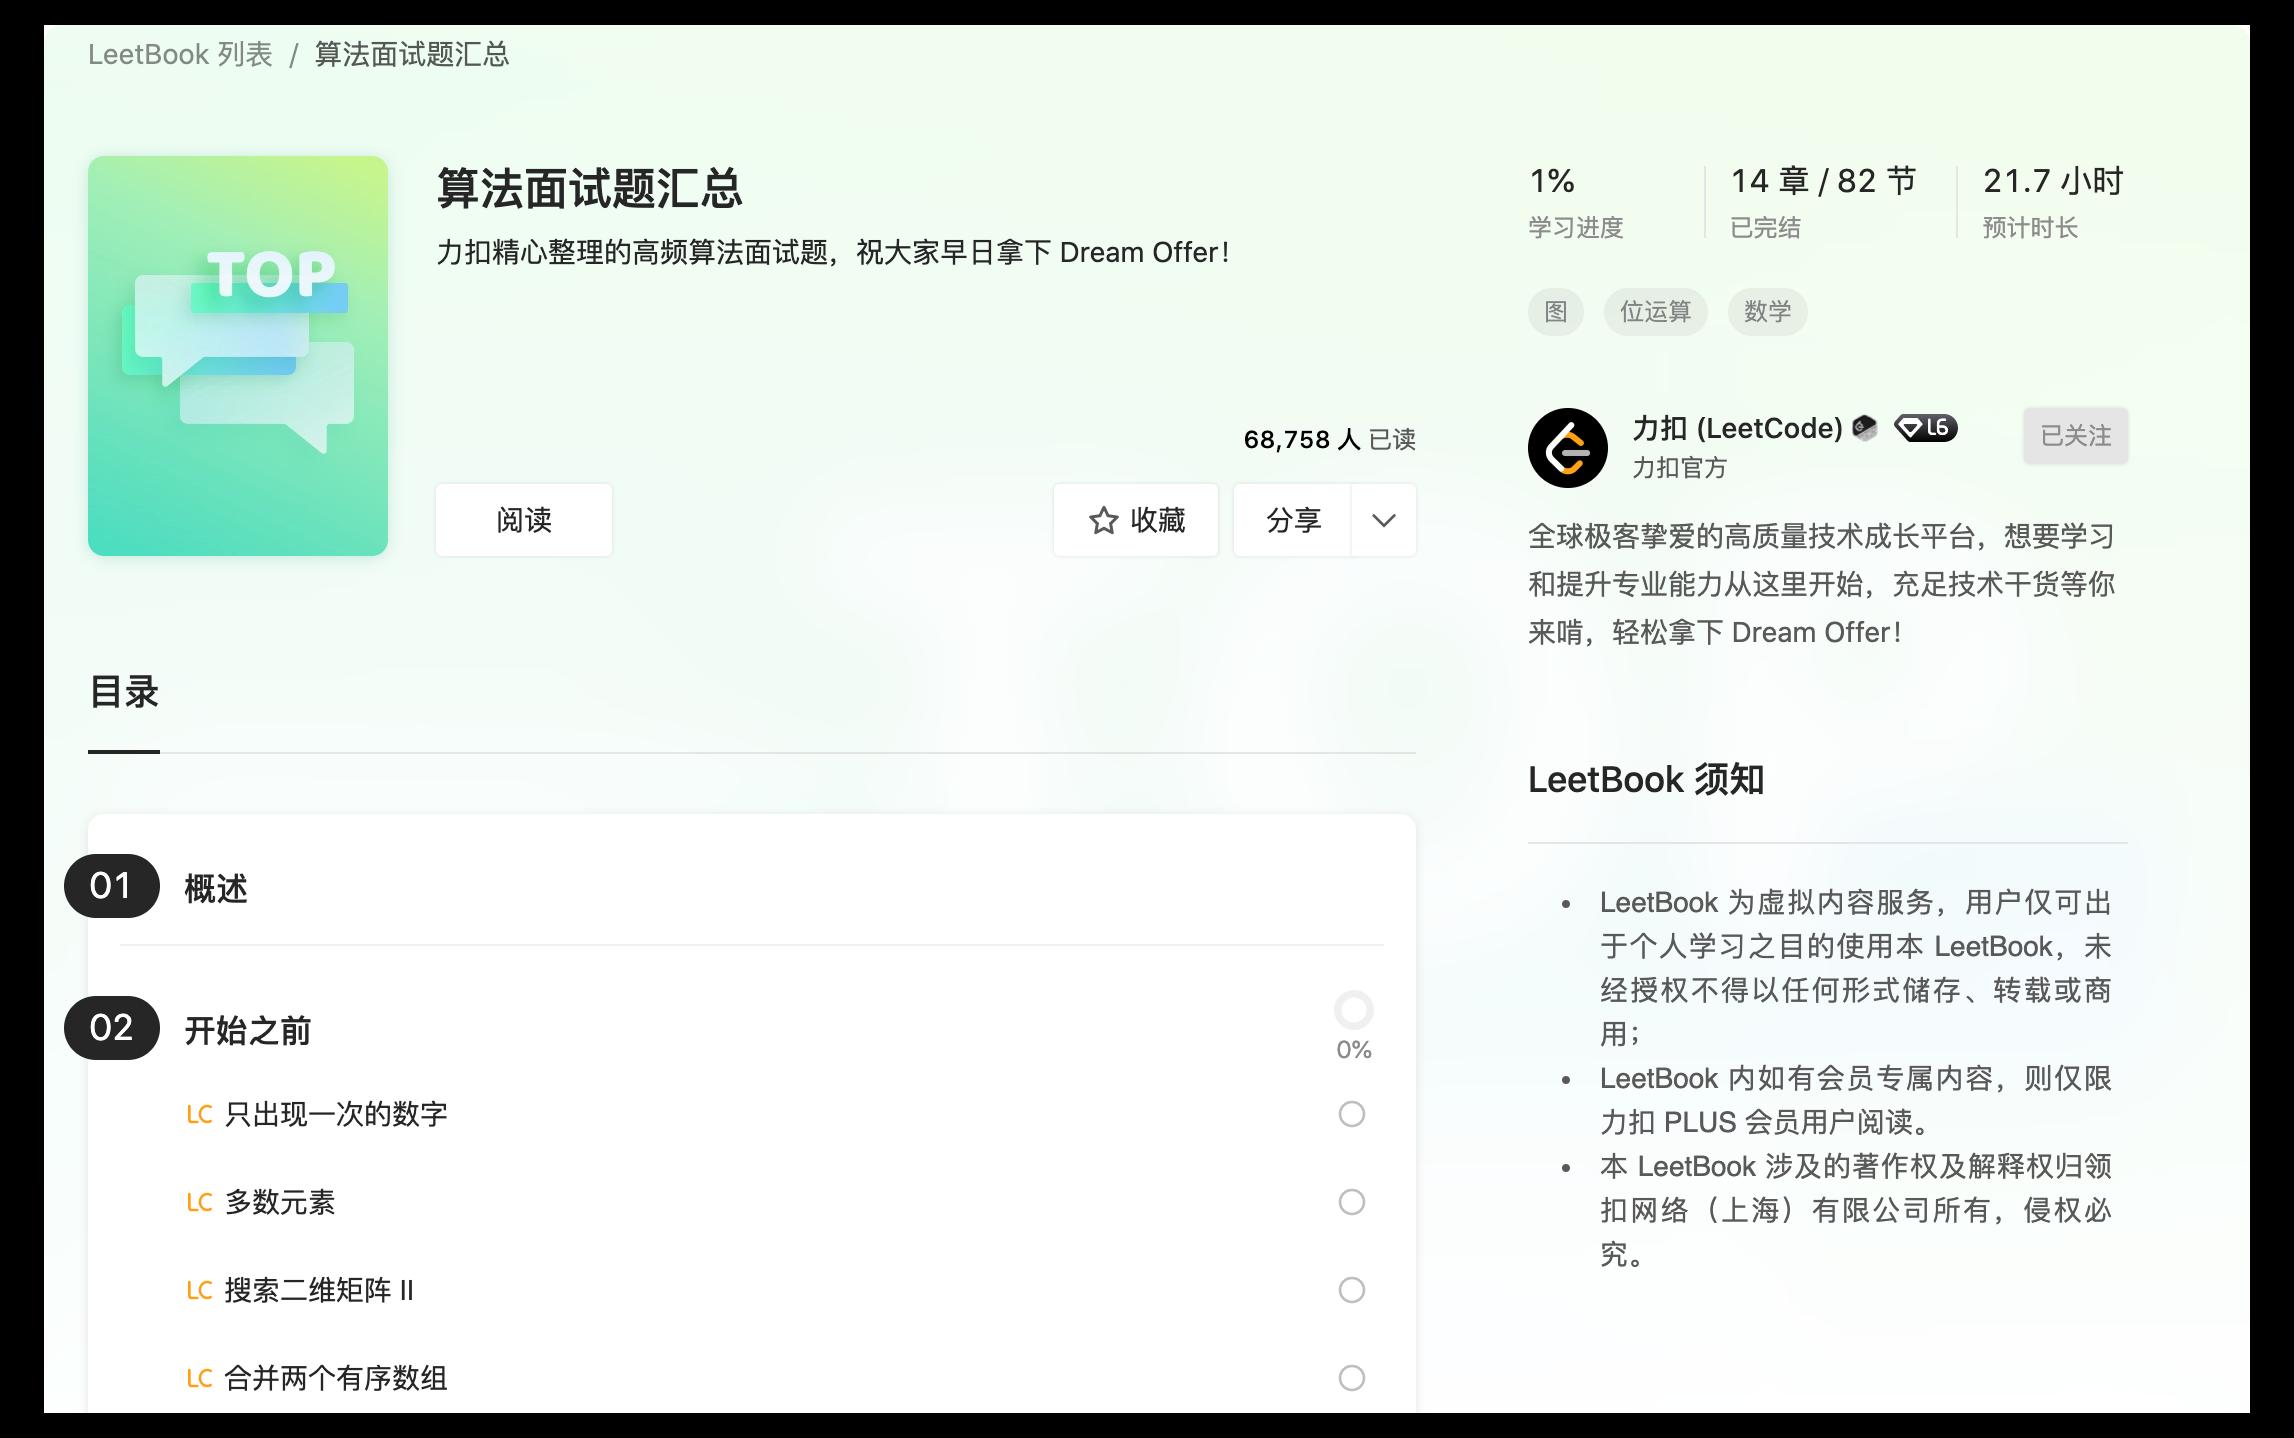 Leetbook 主页面(弧角).png